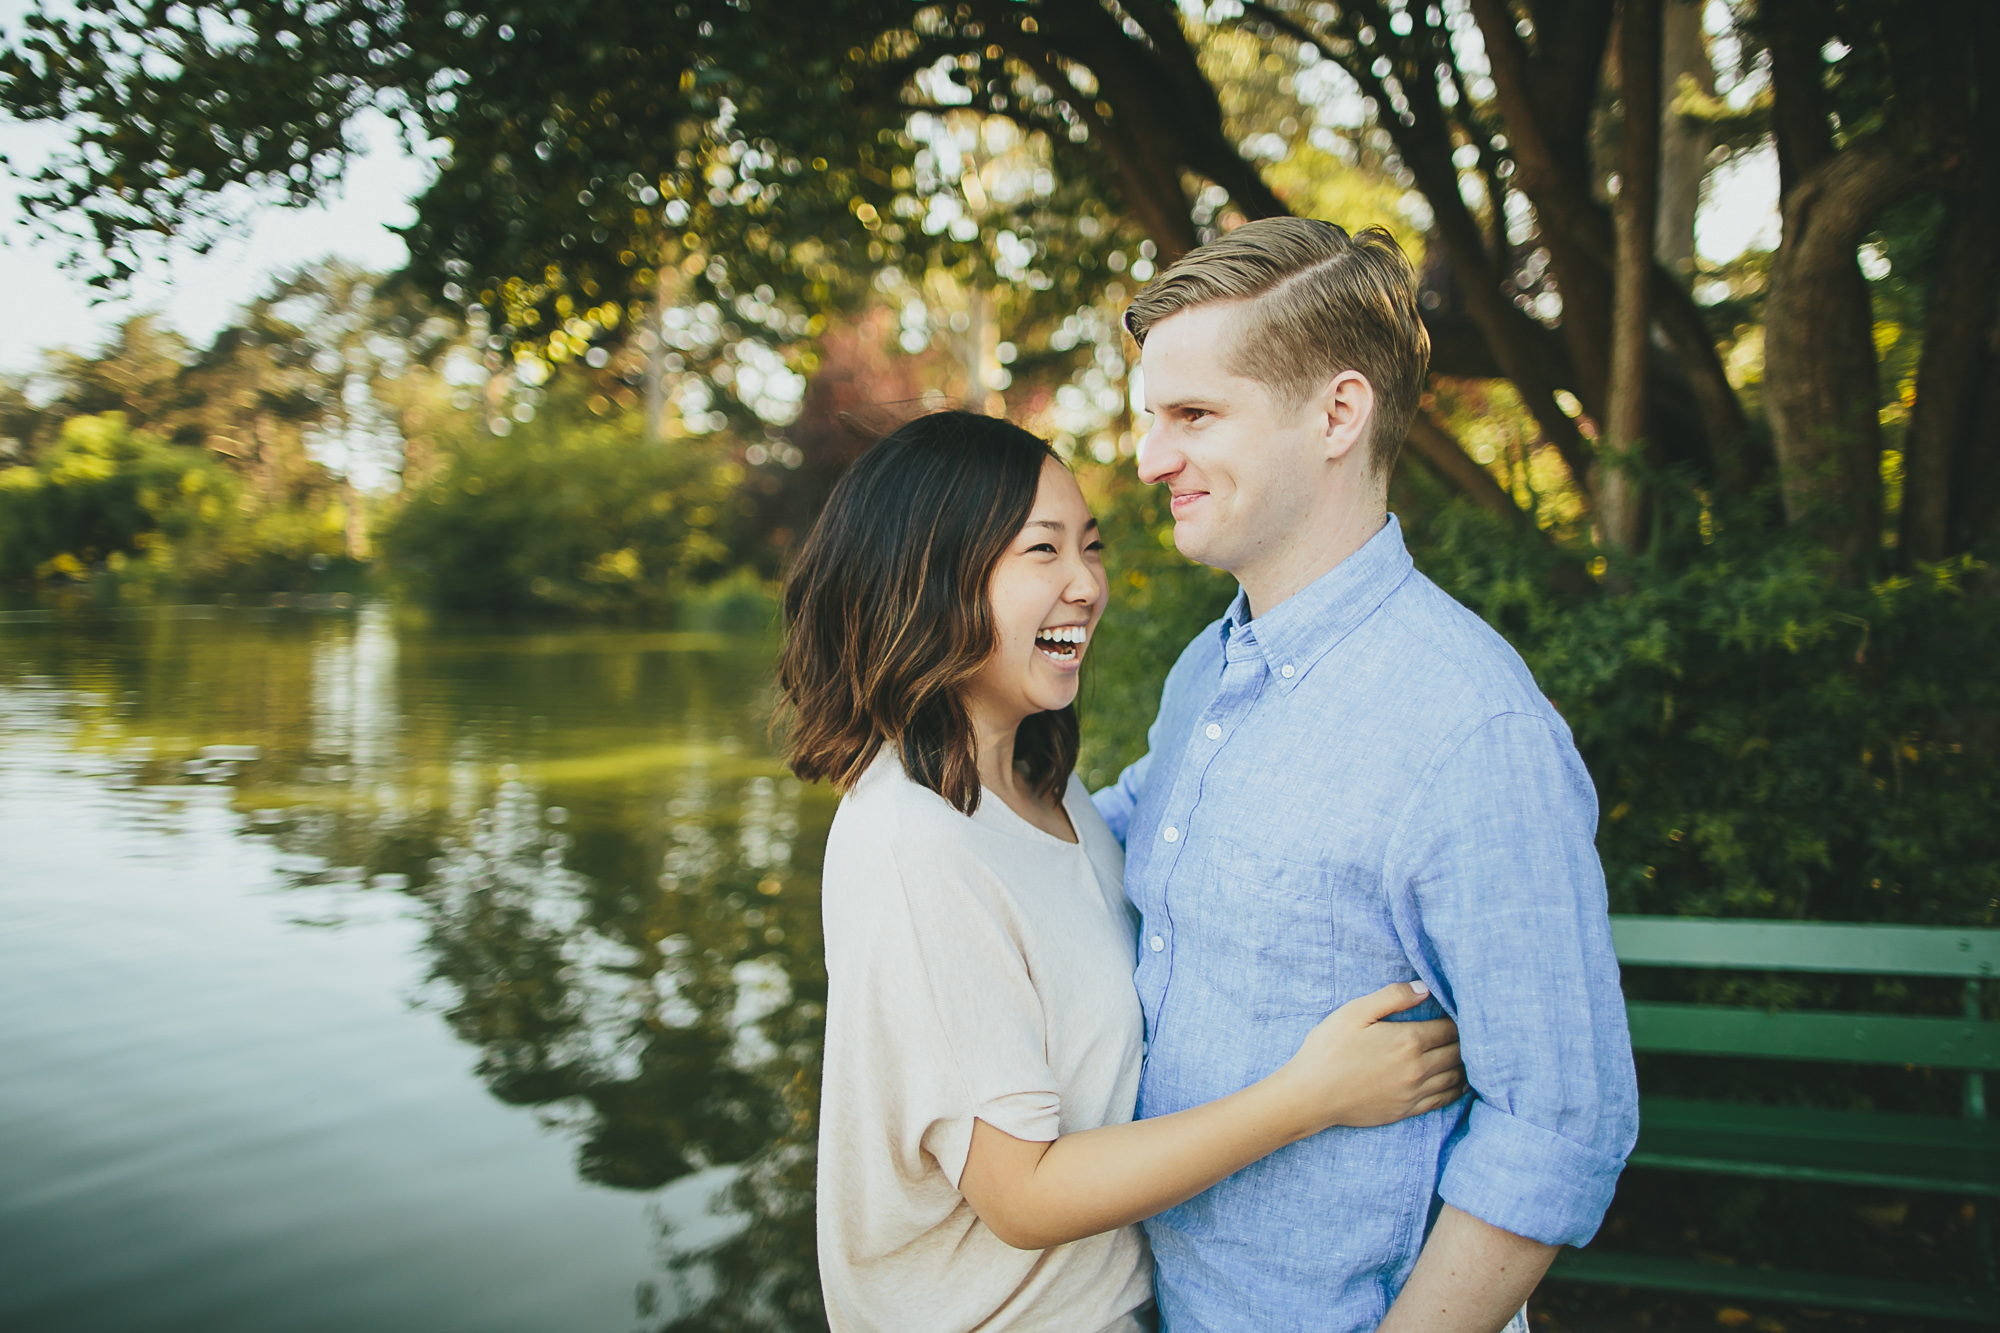 Jenni+Kyle-BLOG_KELLYBOITANO_WEB-15